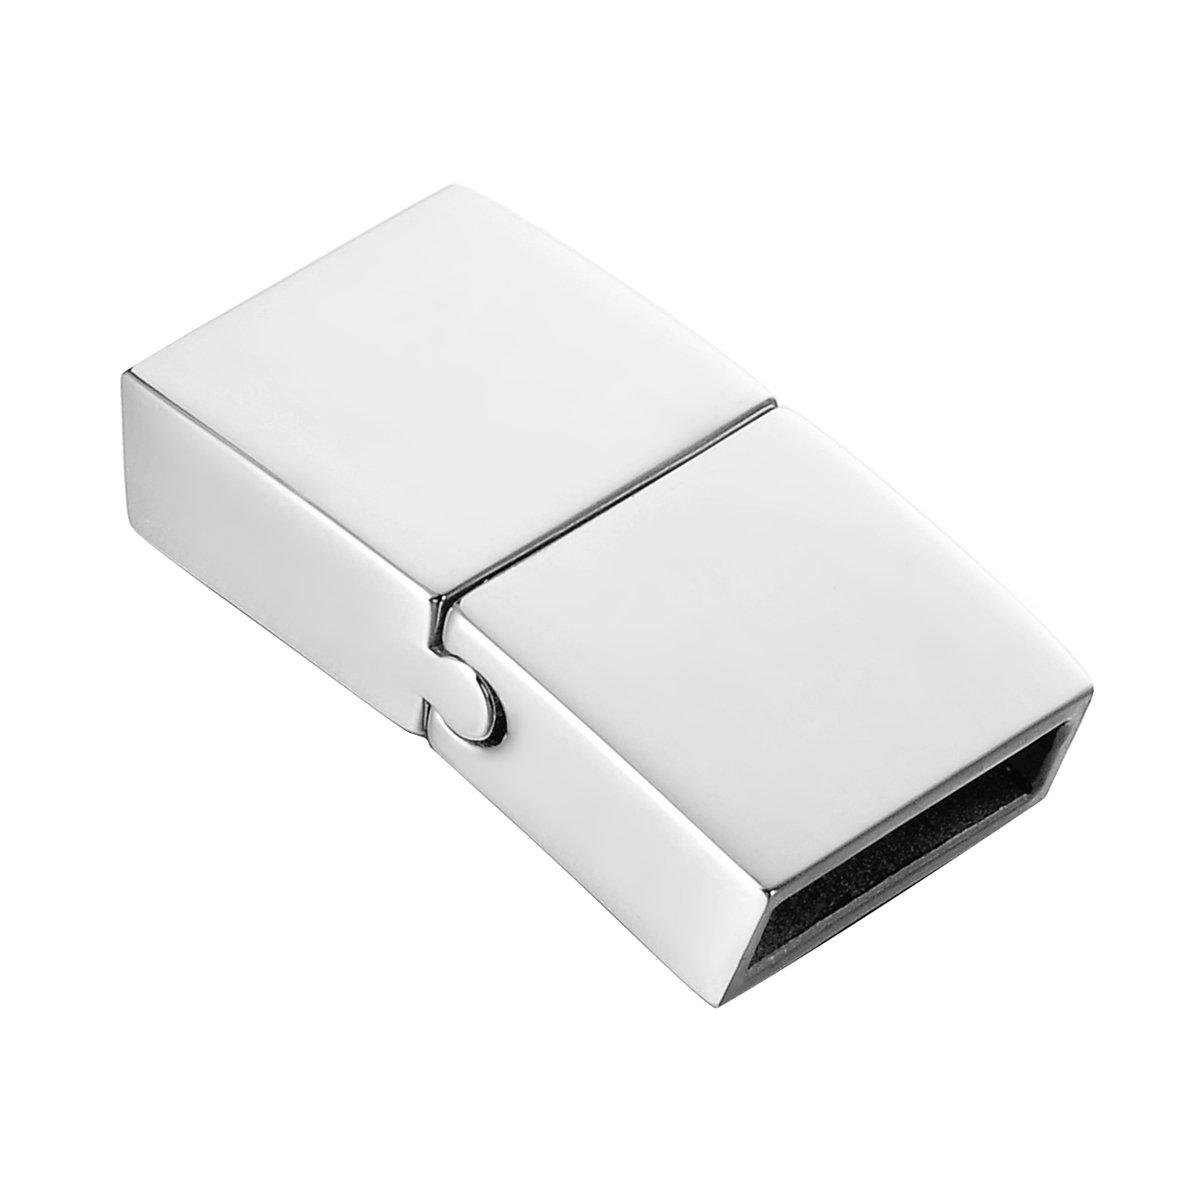 22.4mmx12.0mm HooAMI Edelstahl Handpoliert Lederband Magnetverschluss f/ür 10mmx3mm